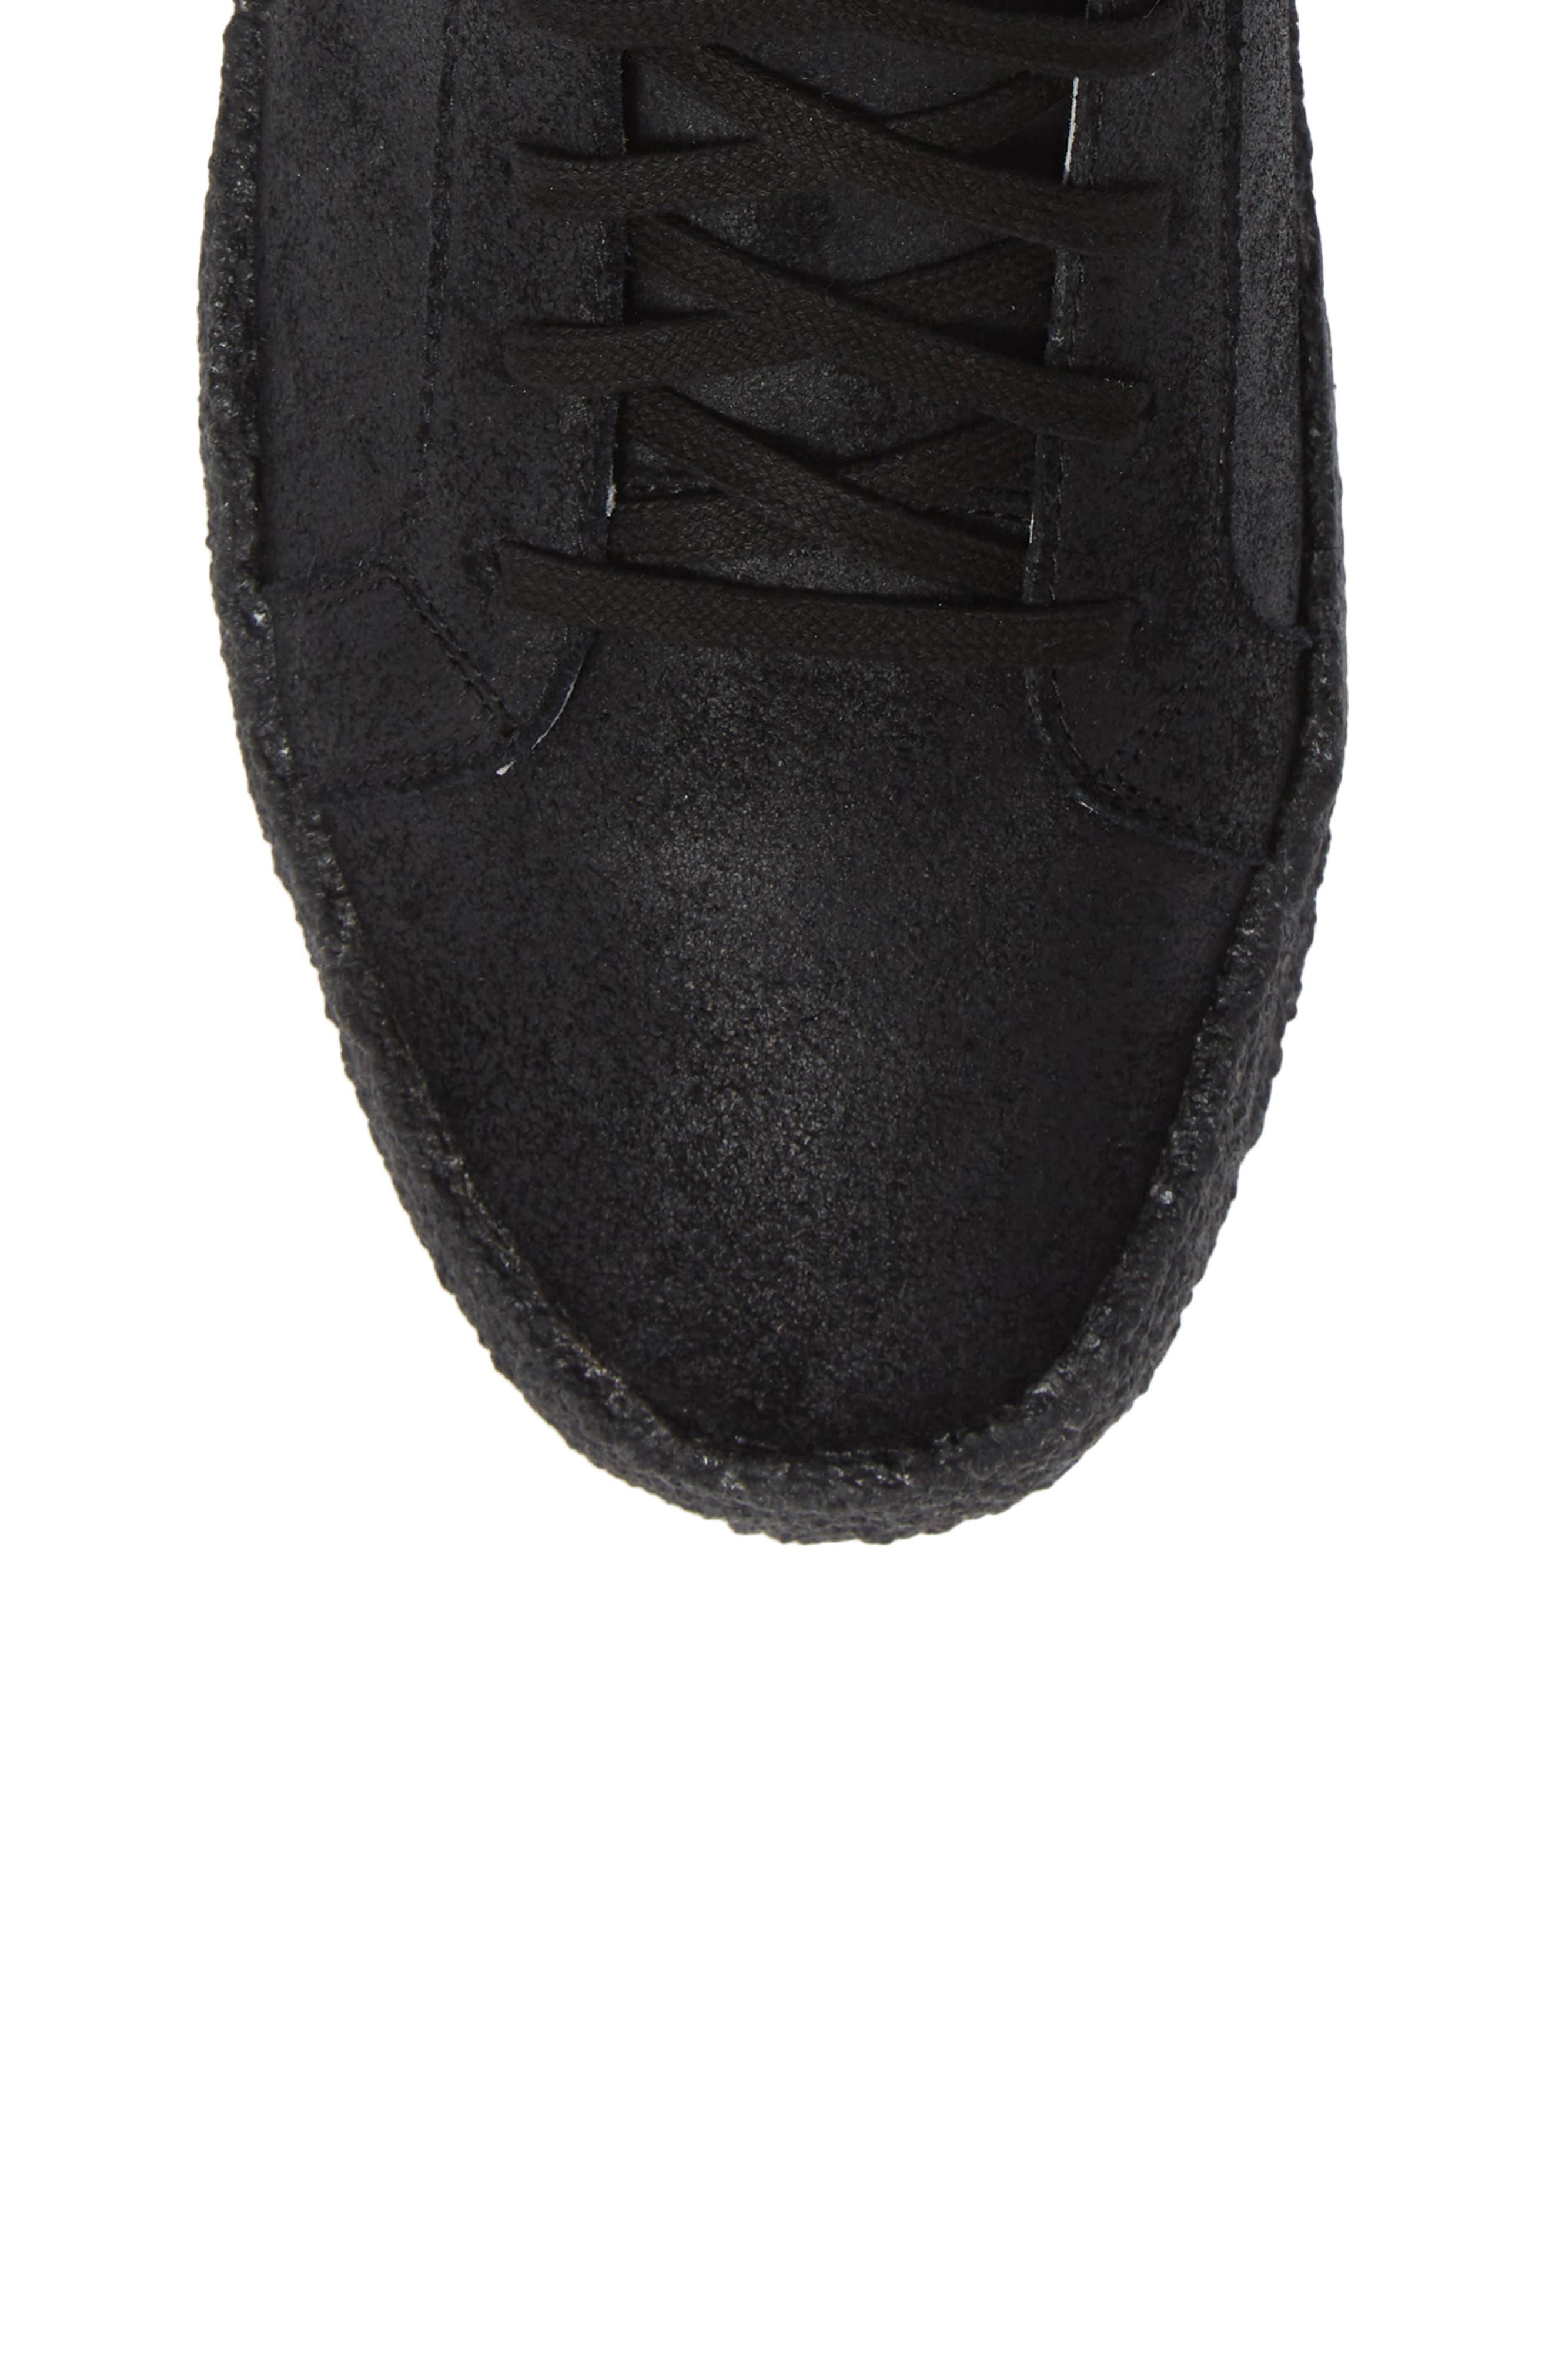 Apa High Top Sneaker,                             Alternate thumbnail 5, color,                             TRIPLE BLACK LEATHER